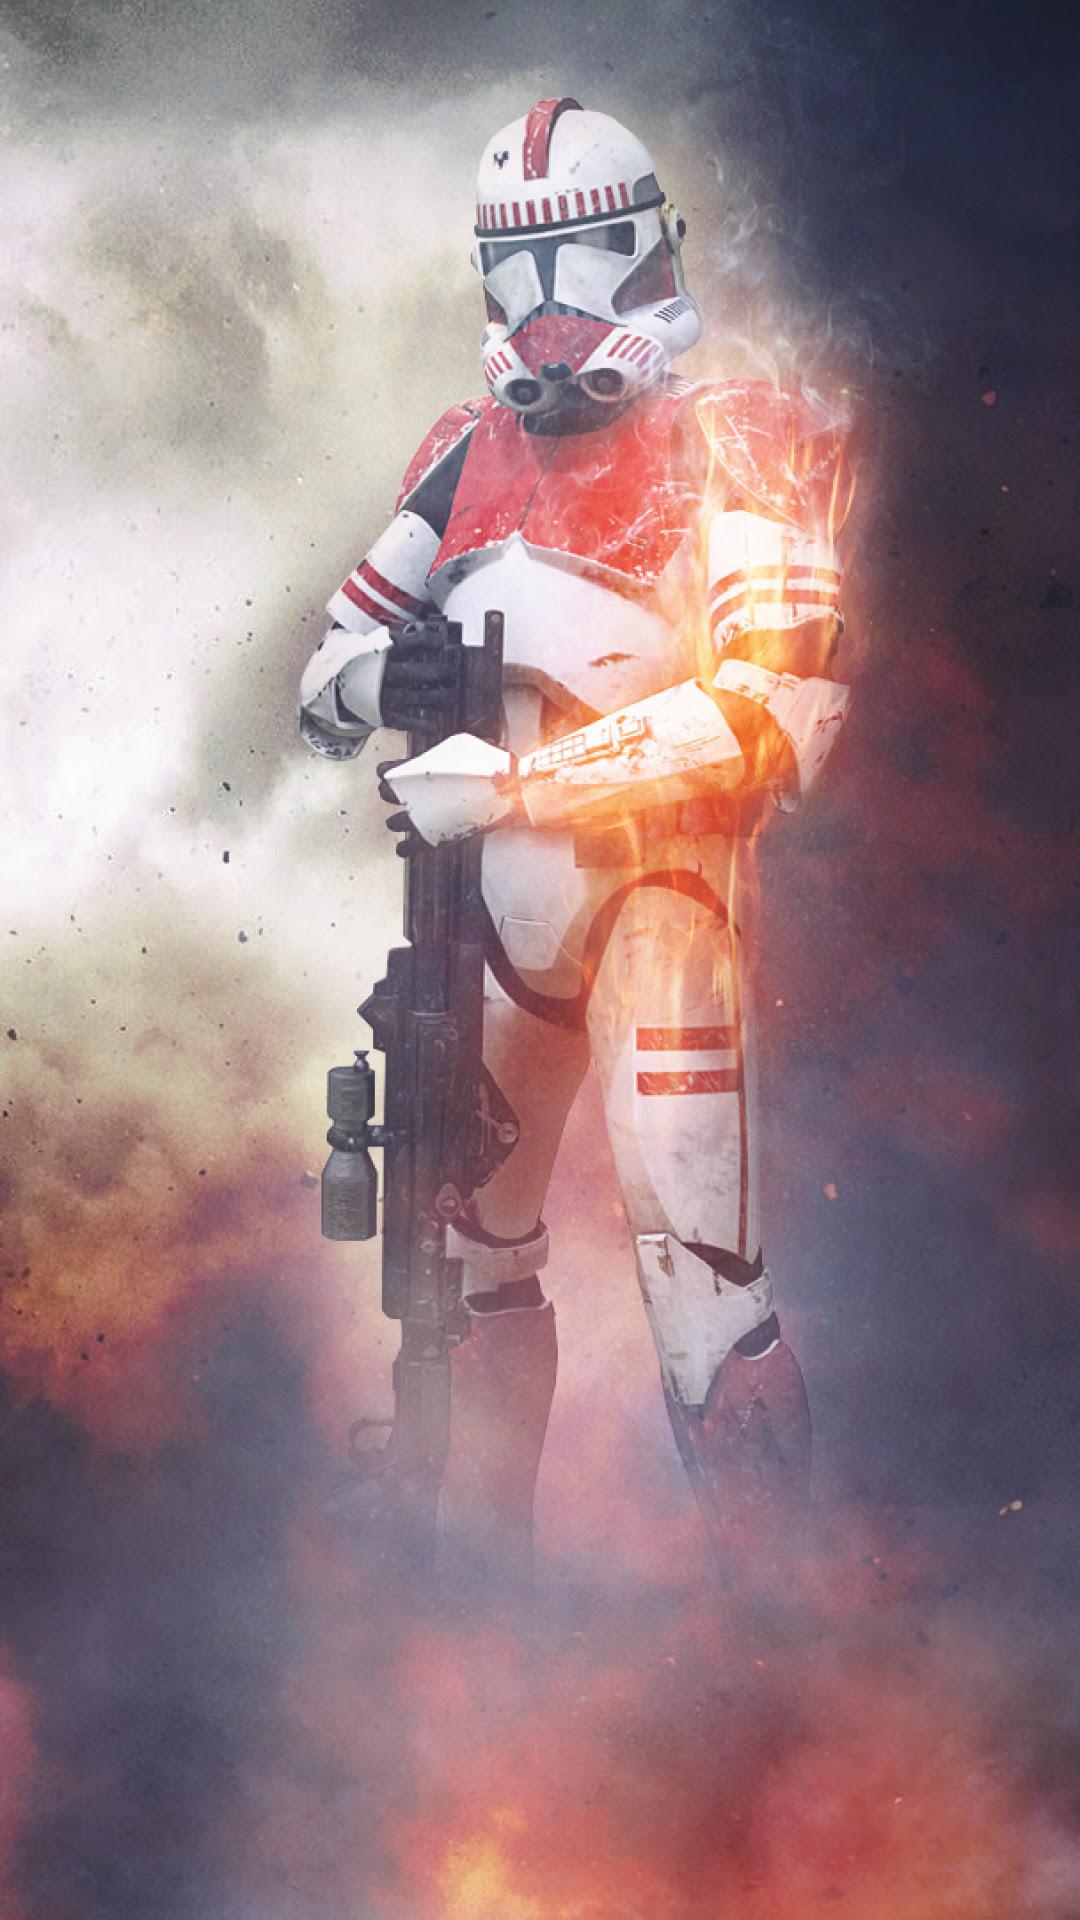 Clone Trooper Iphone Wallpaper 65 Images